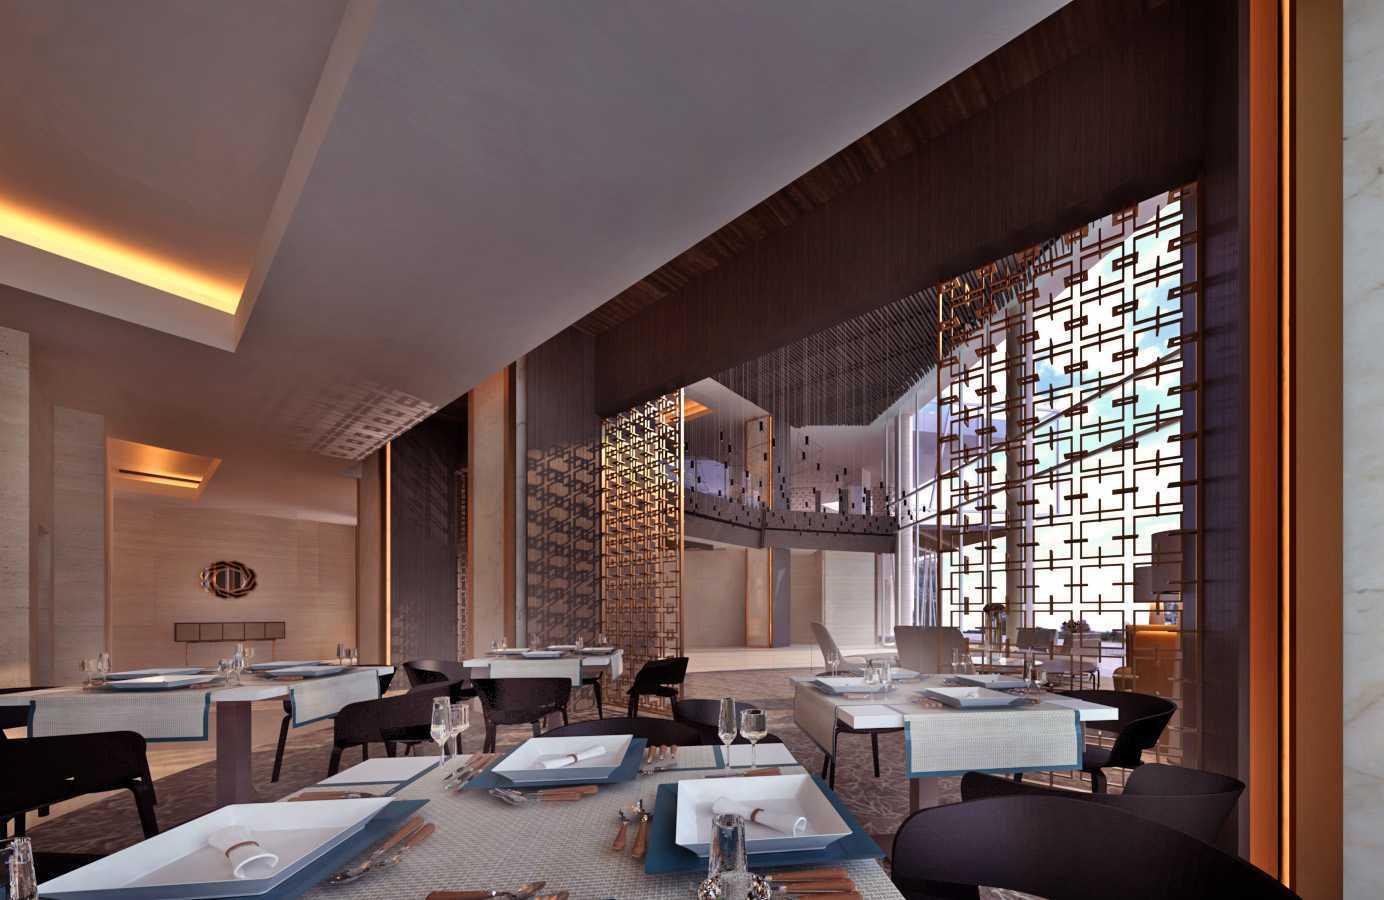 Rinto Katili, S.s.n, M.m Lobby Hotel Pemuda 17, Surabaya Surabaya Surabaya All Dining_Hotel_Modern Contemporer Style Contemporary,modern 24815